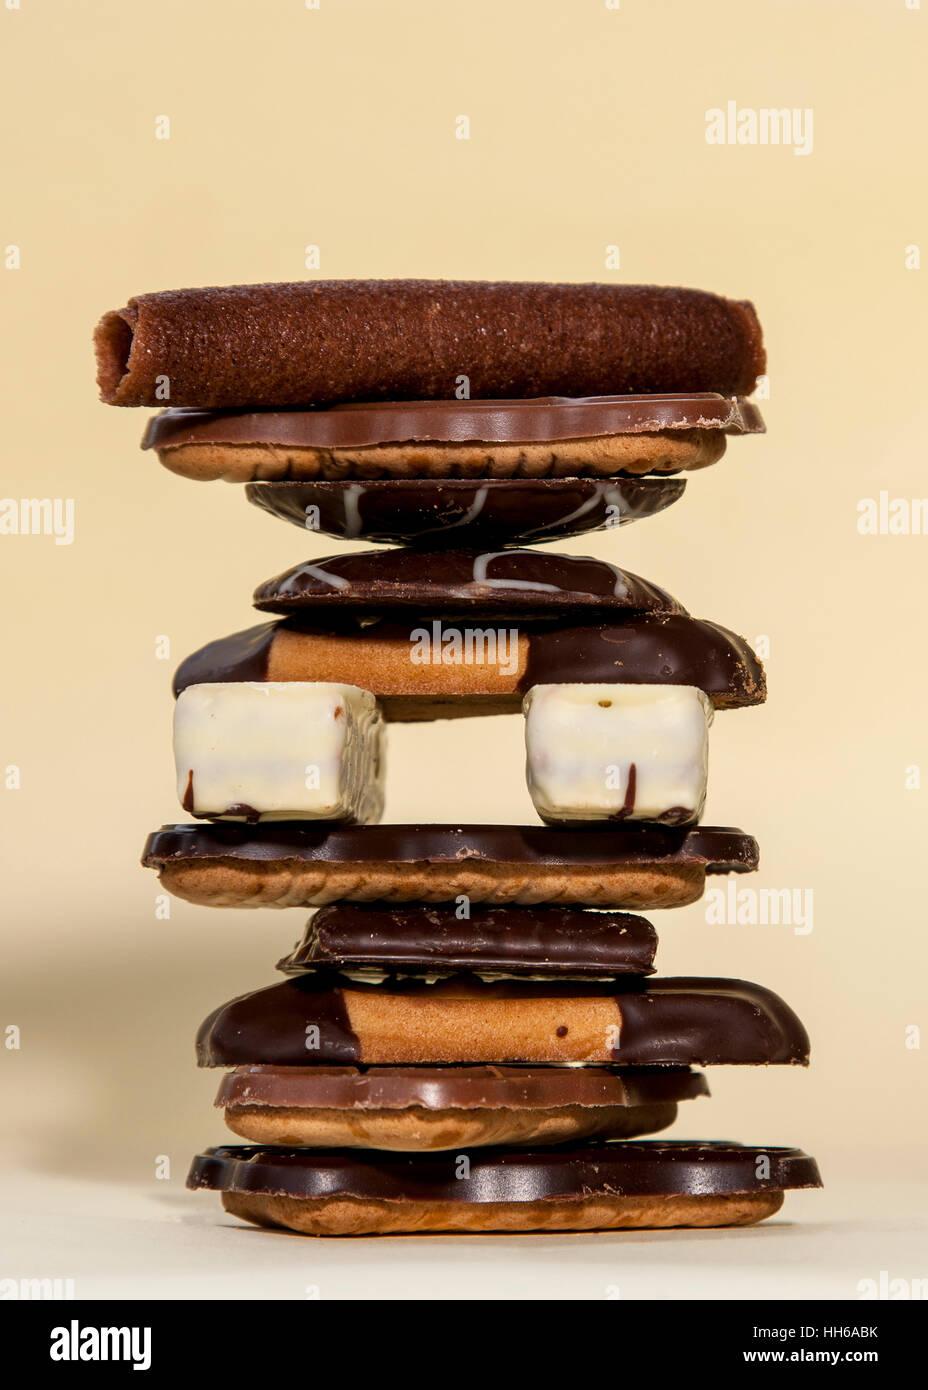 Ein Stapel, Turm Der Schokoladenkekse Stockbild